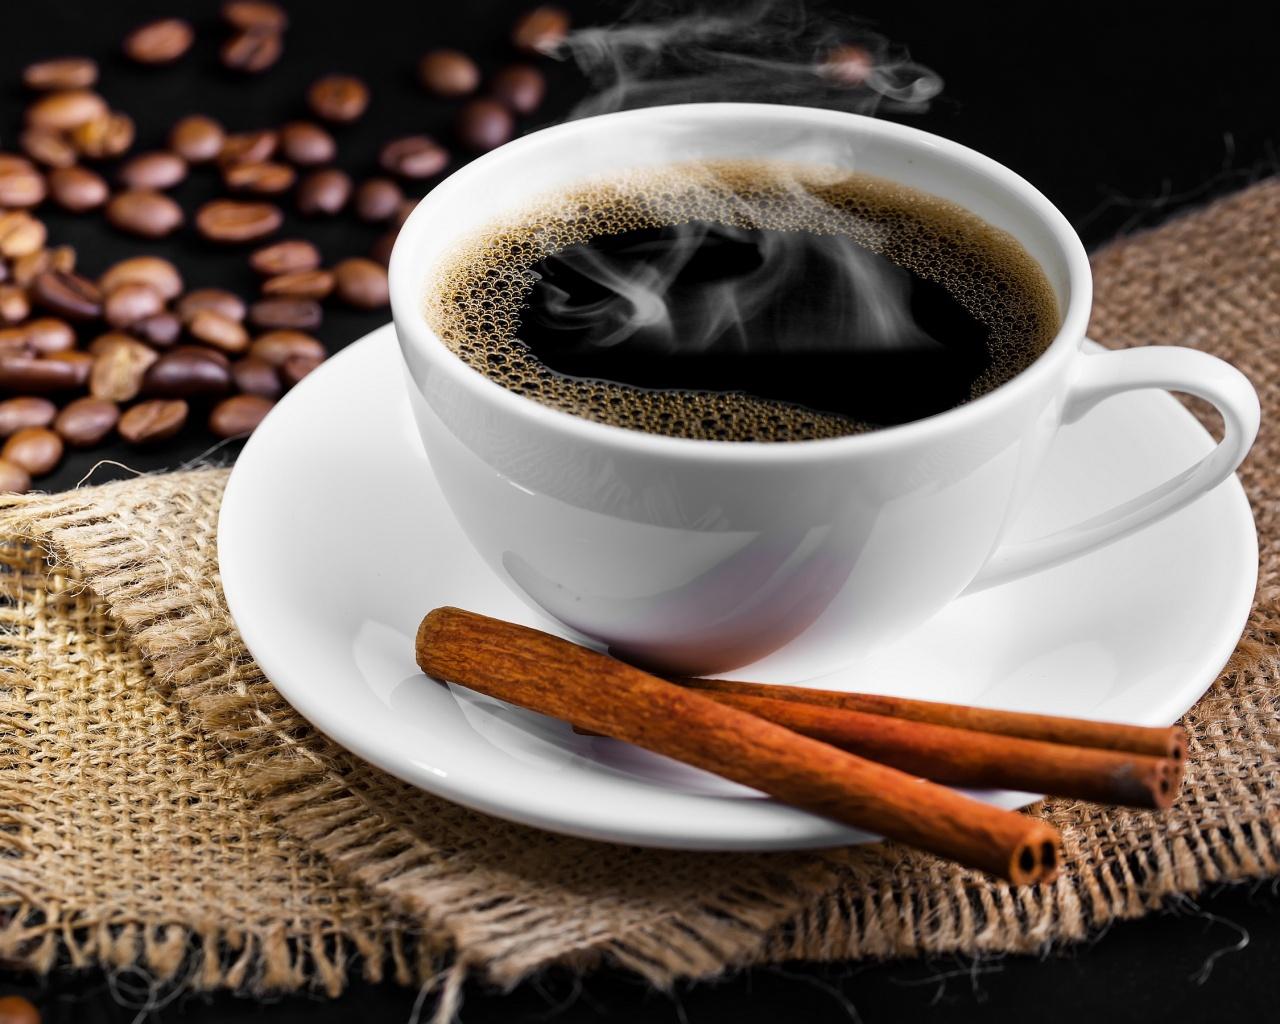 kopi merusak gigi senyuman menawan hilang